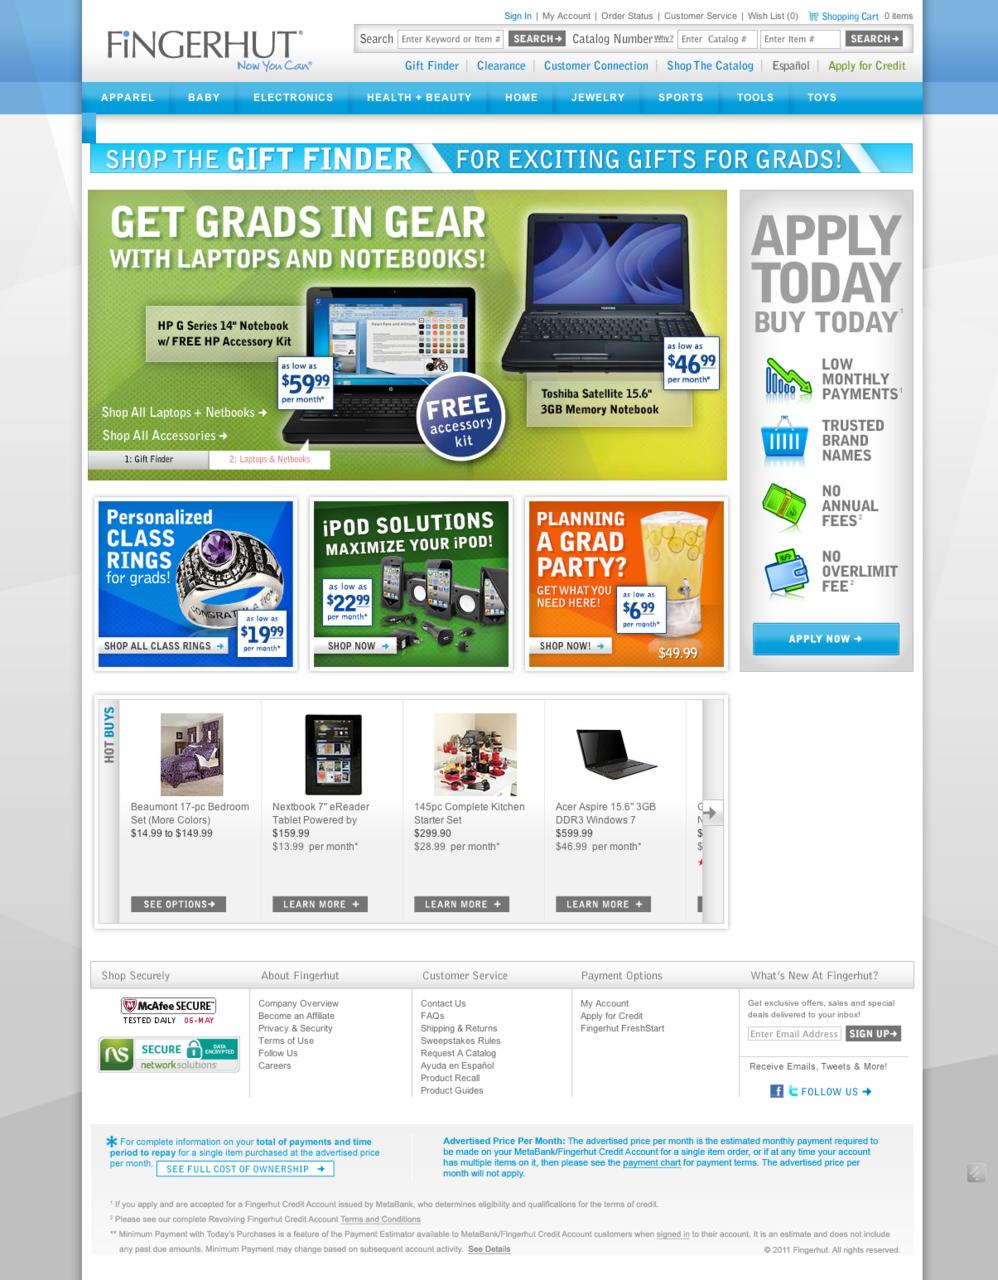 www.fingerhut.com